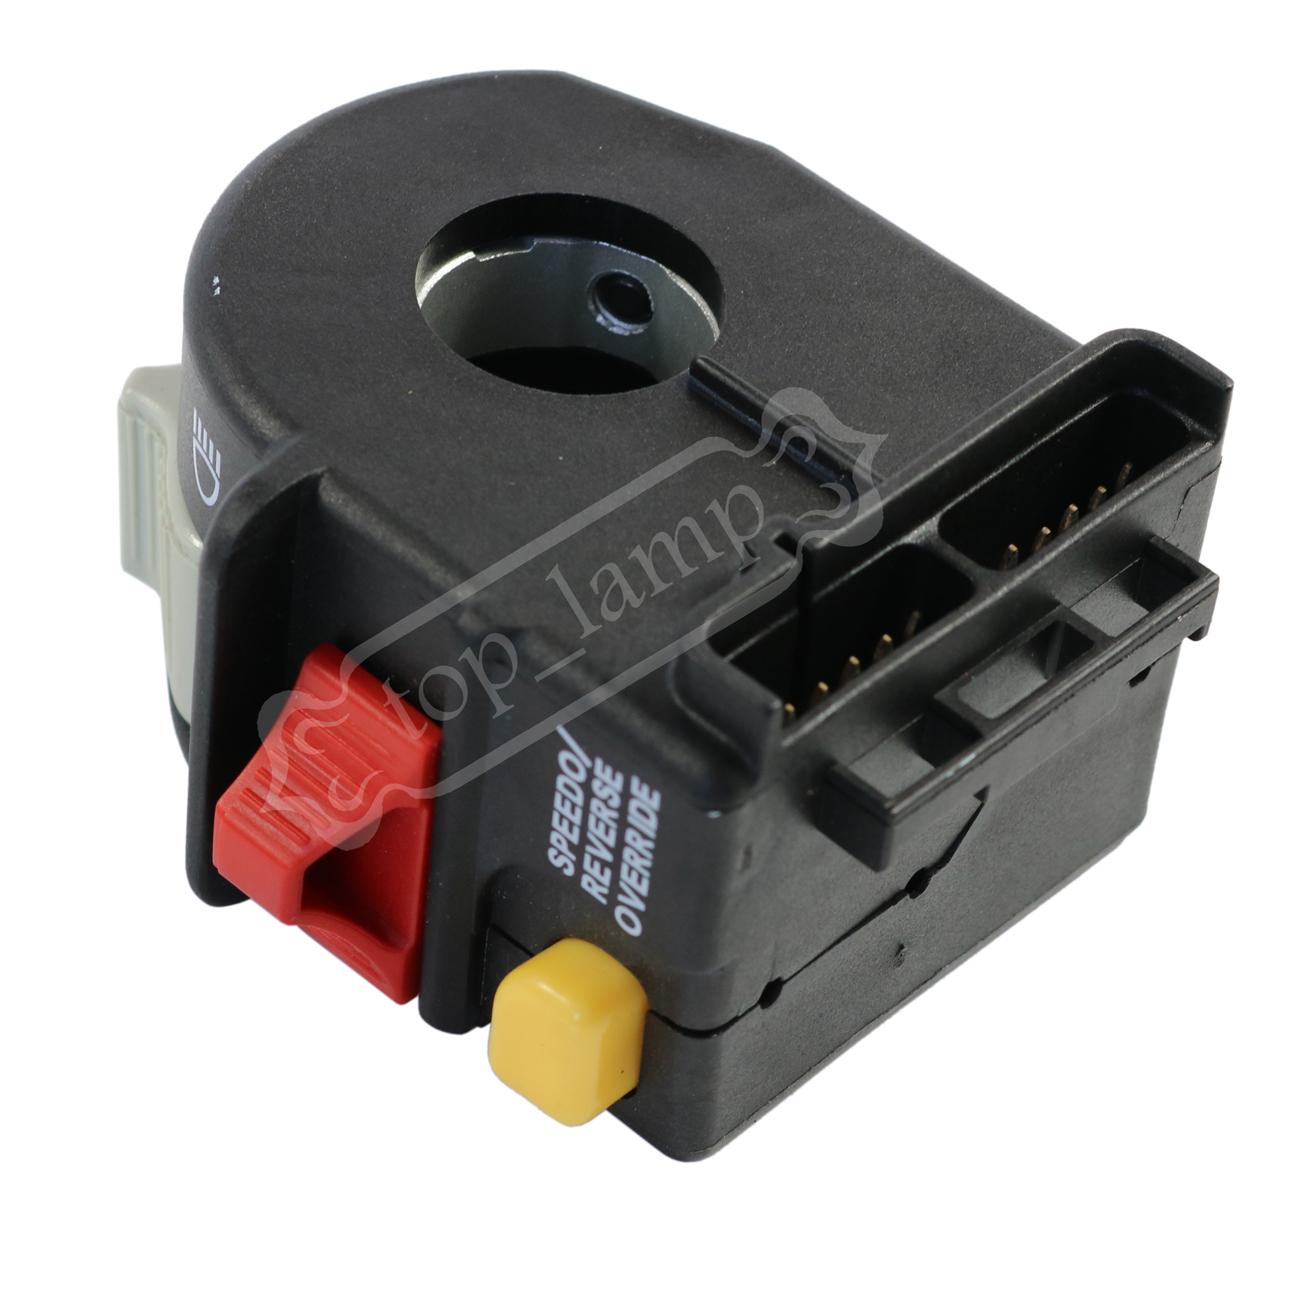 Kimpex High Performance CDI Box Ref 30410-HC0-003 Honda ATC250R TRX250R 86-92